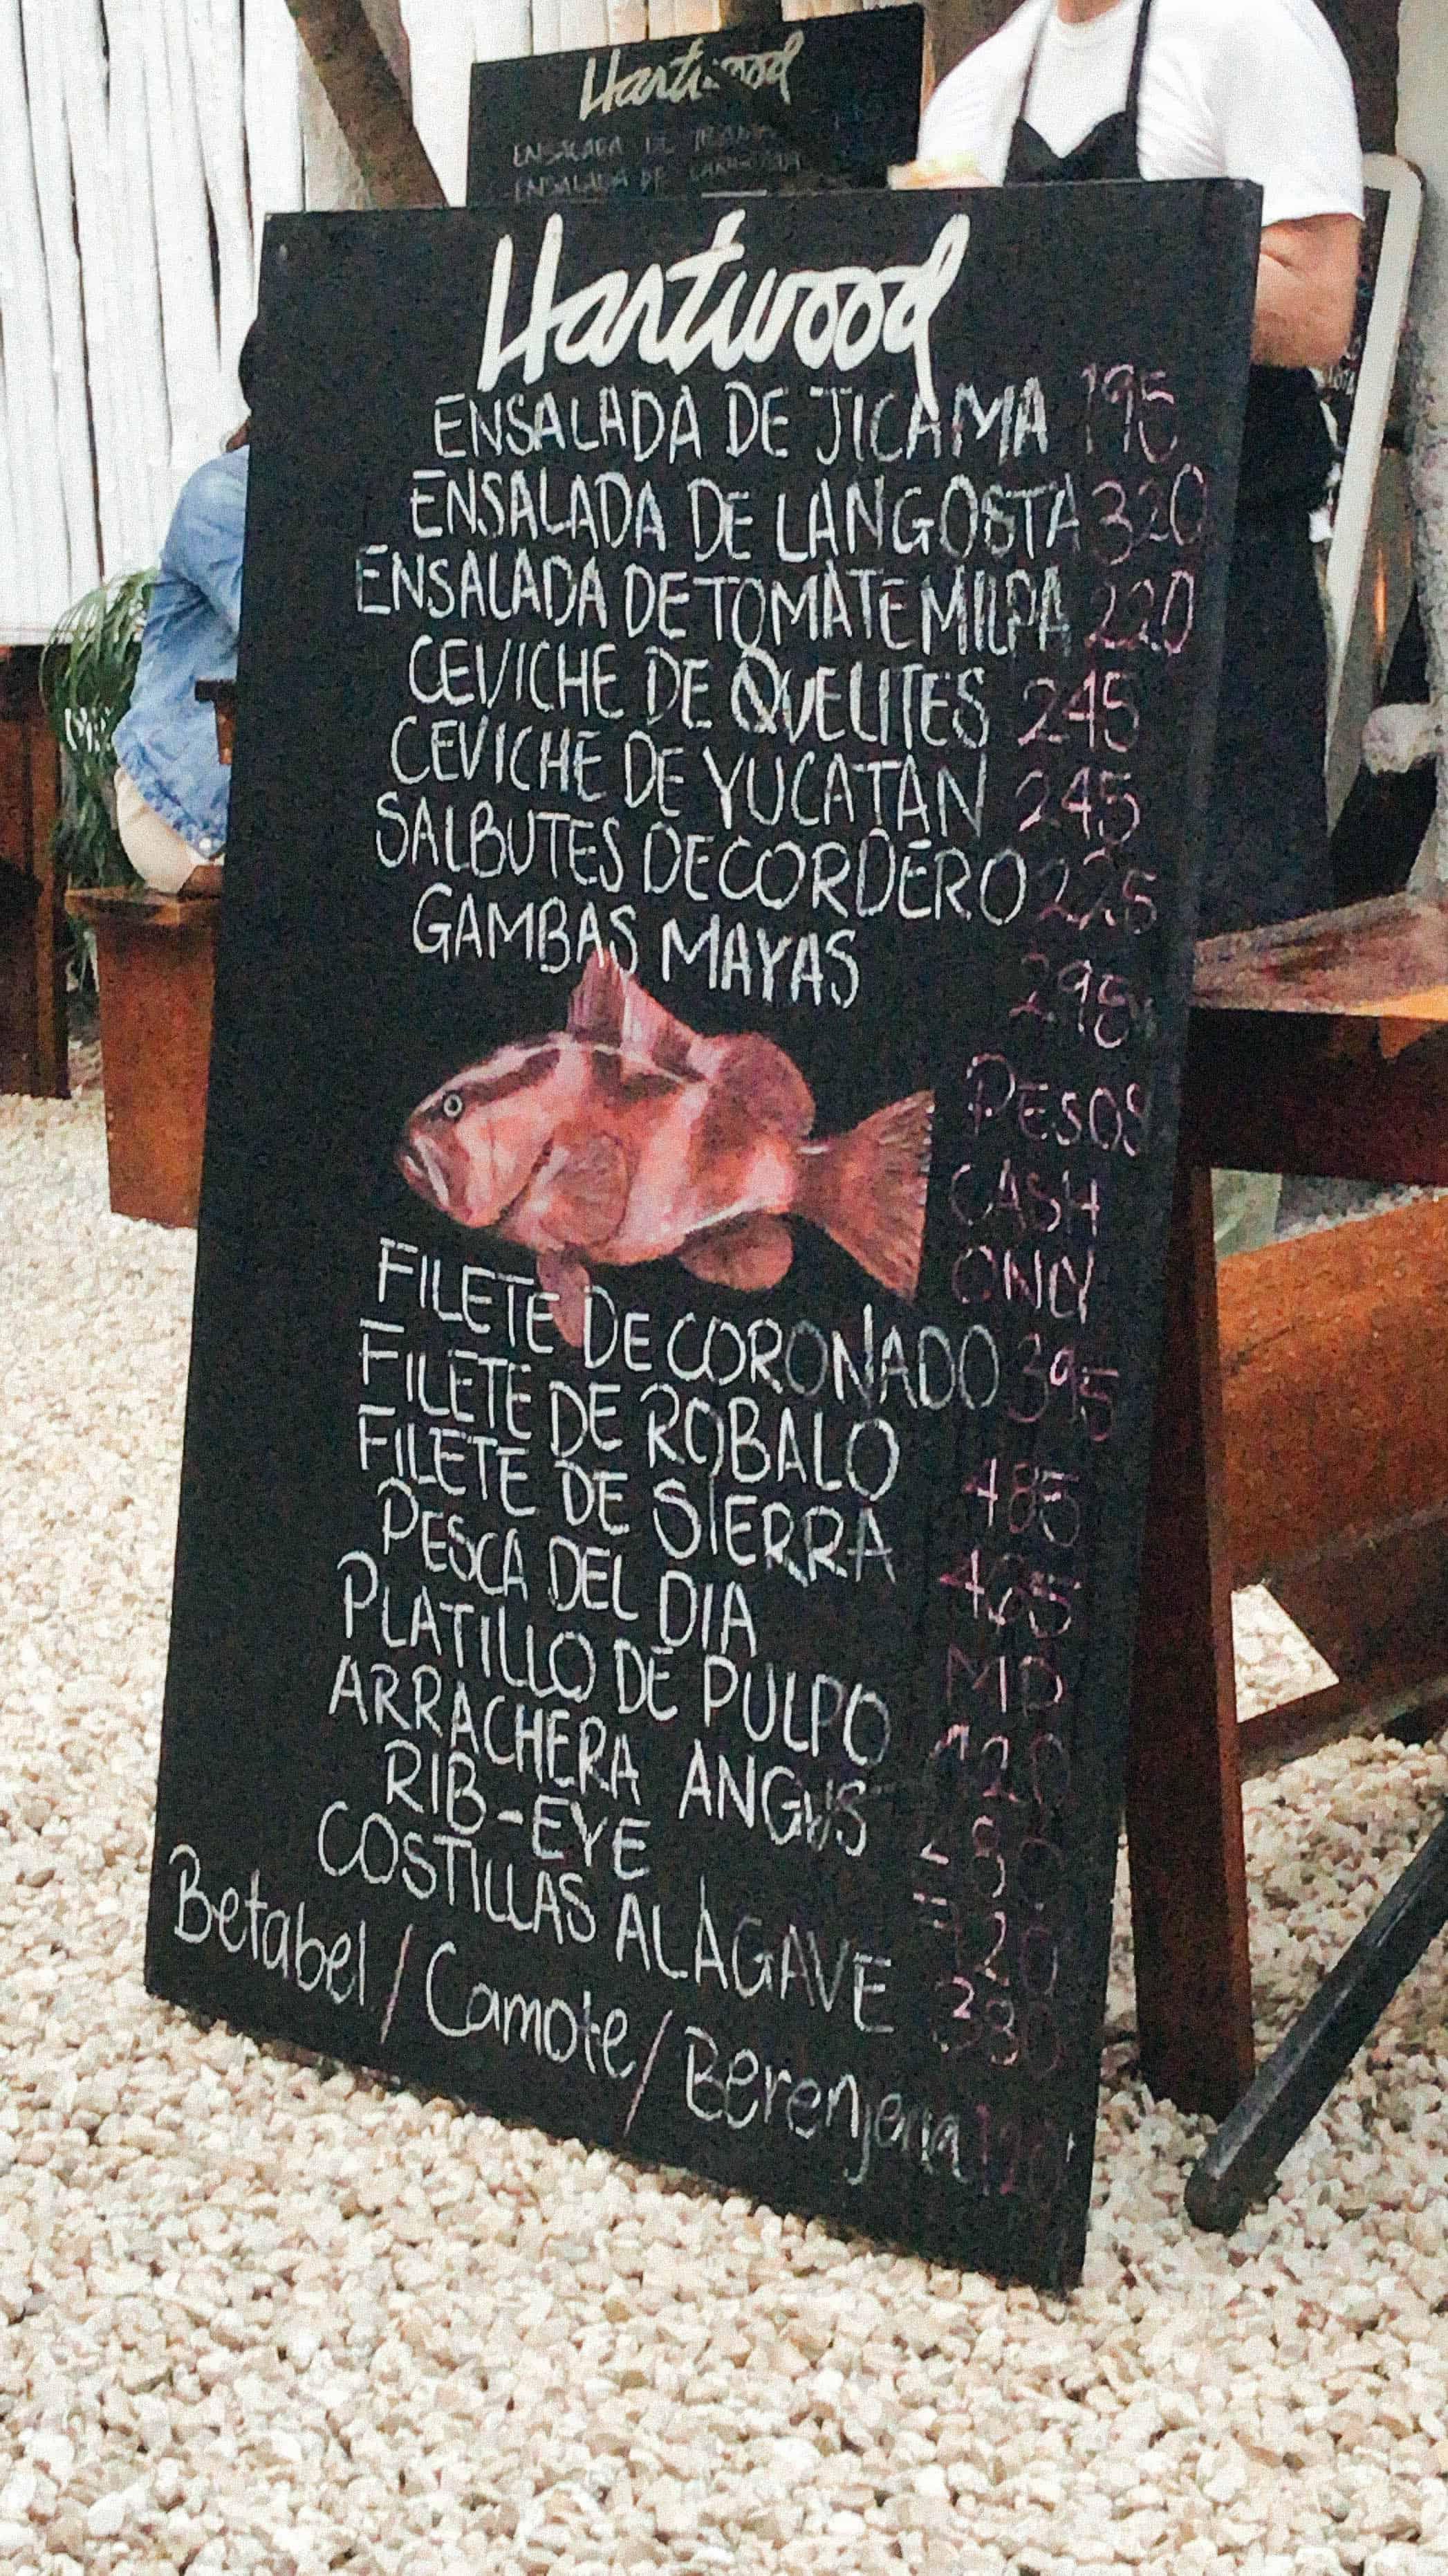 Roasted Beets with Avocado Habanero Crema